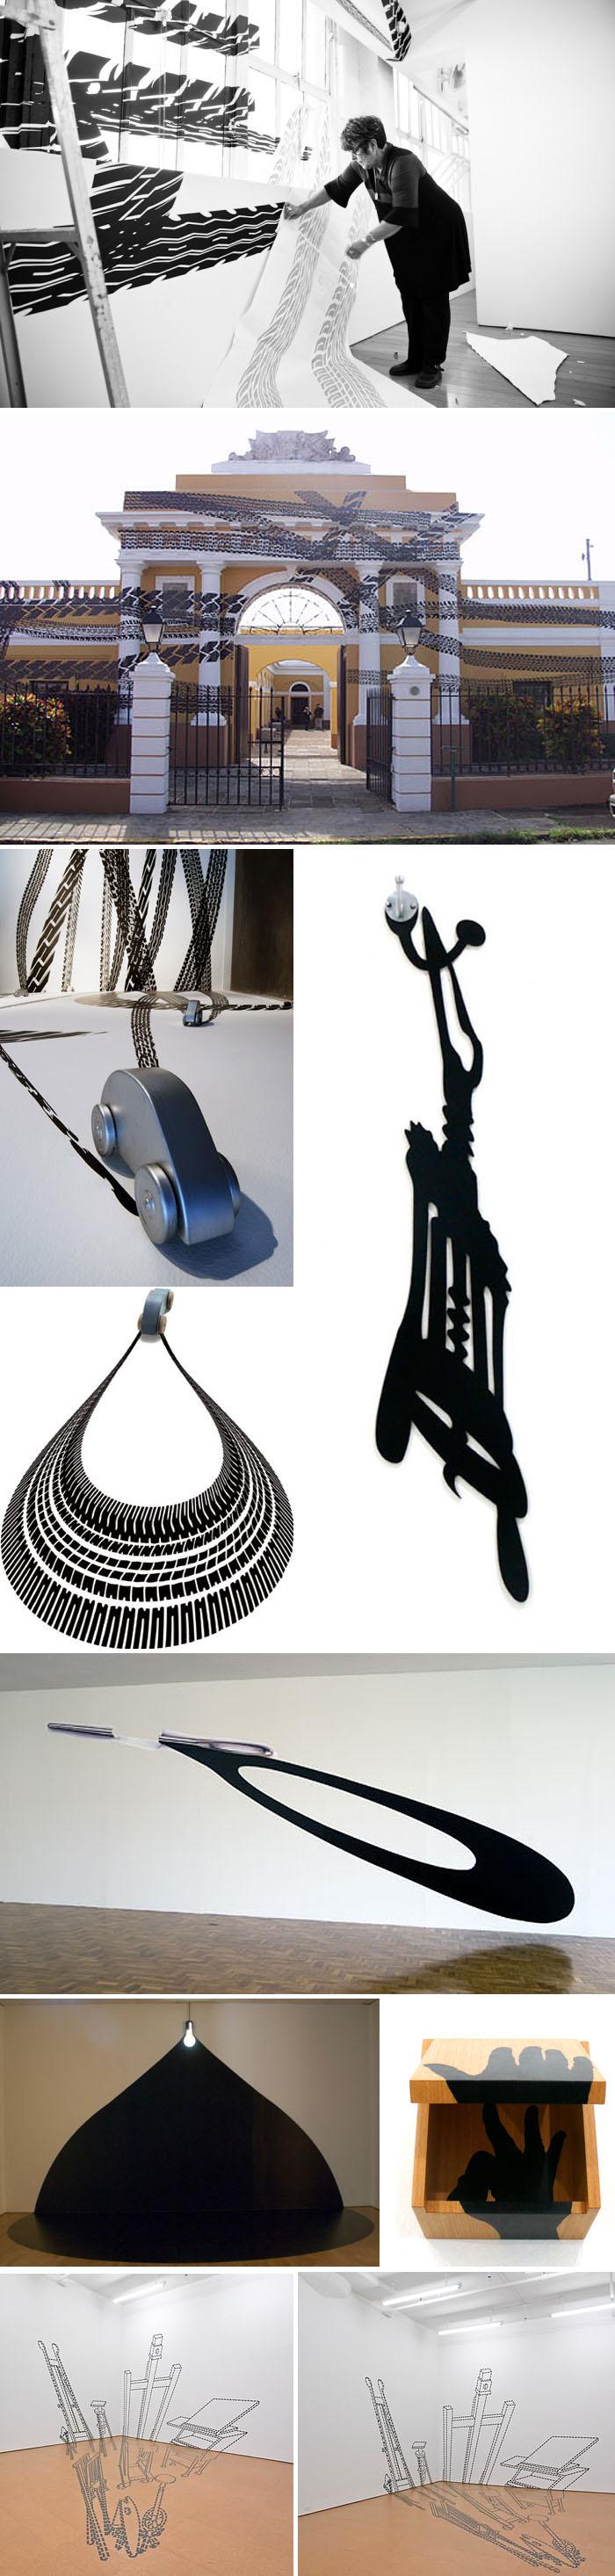 Car tracks application, art installation, Octopus series, contemporary Brazilian art, cut vinyl, perspective